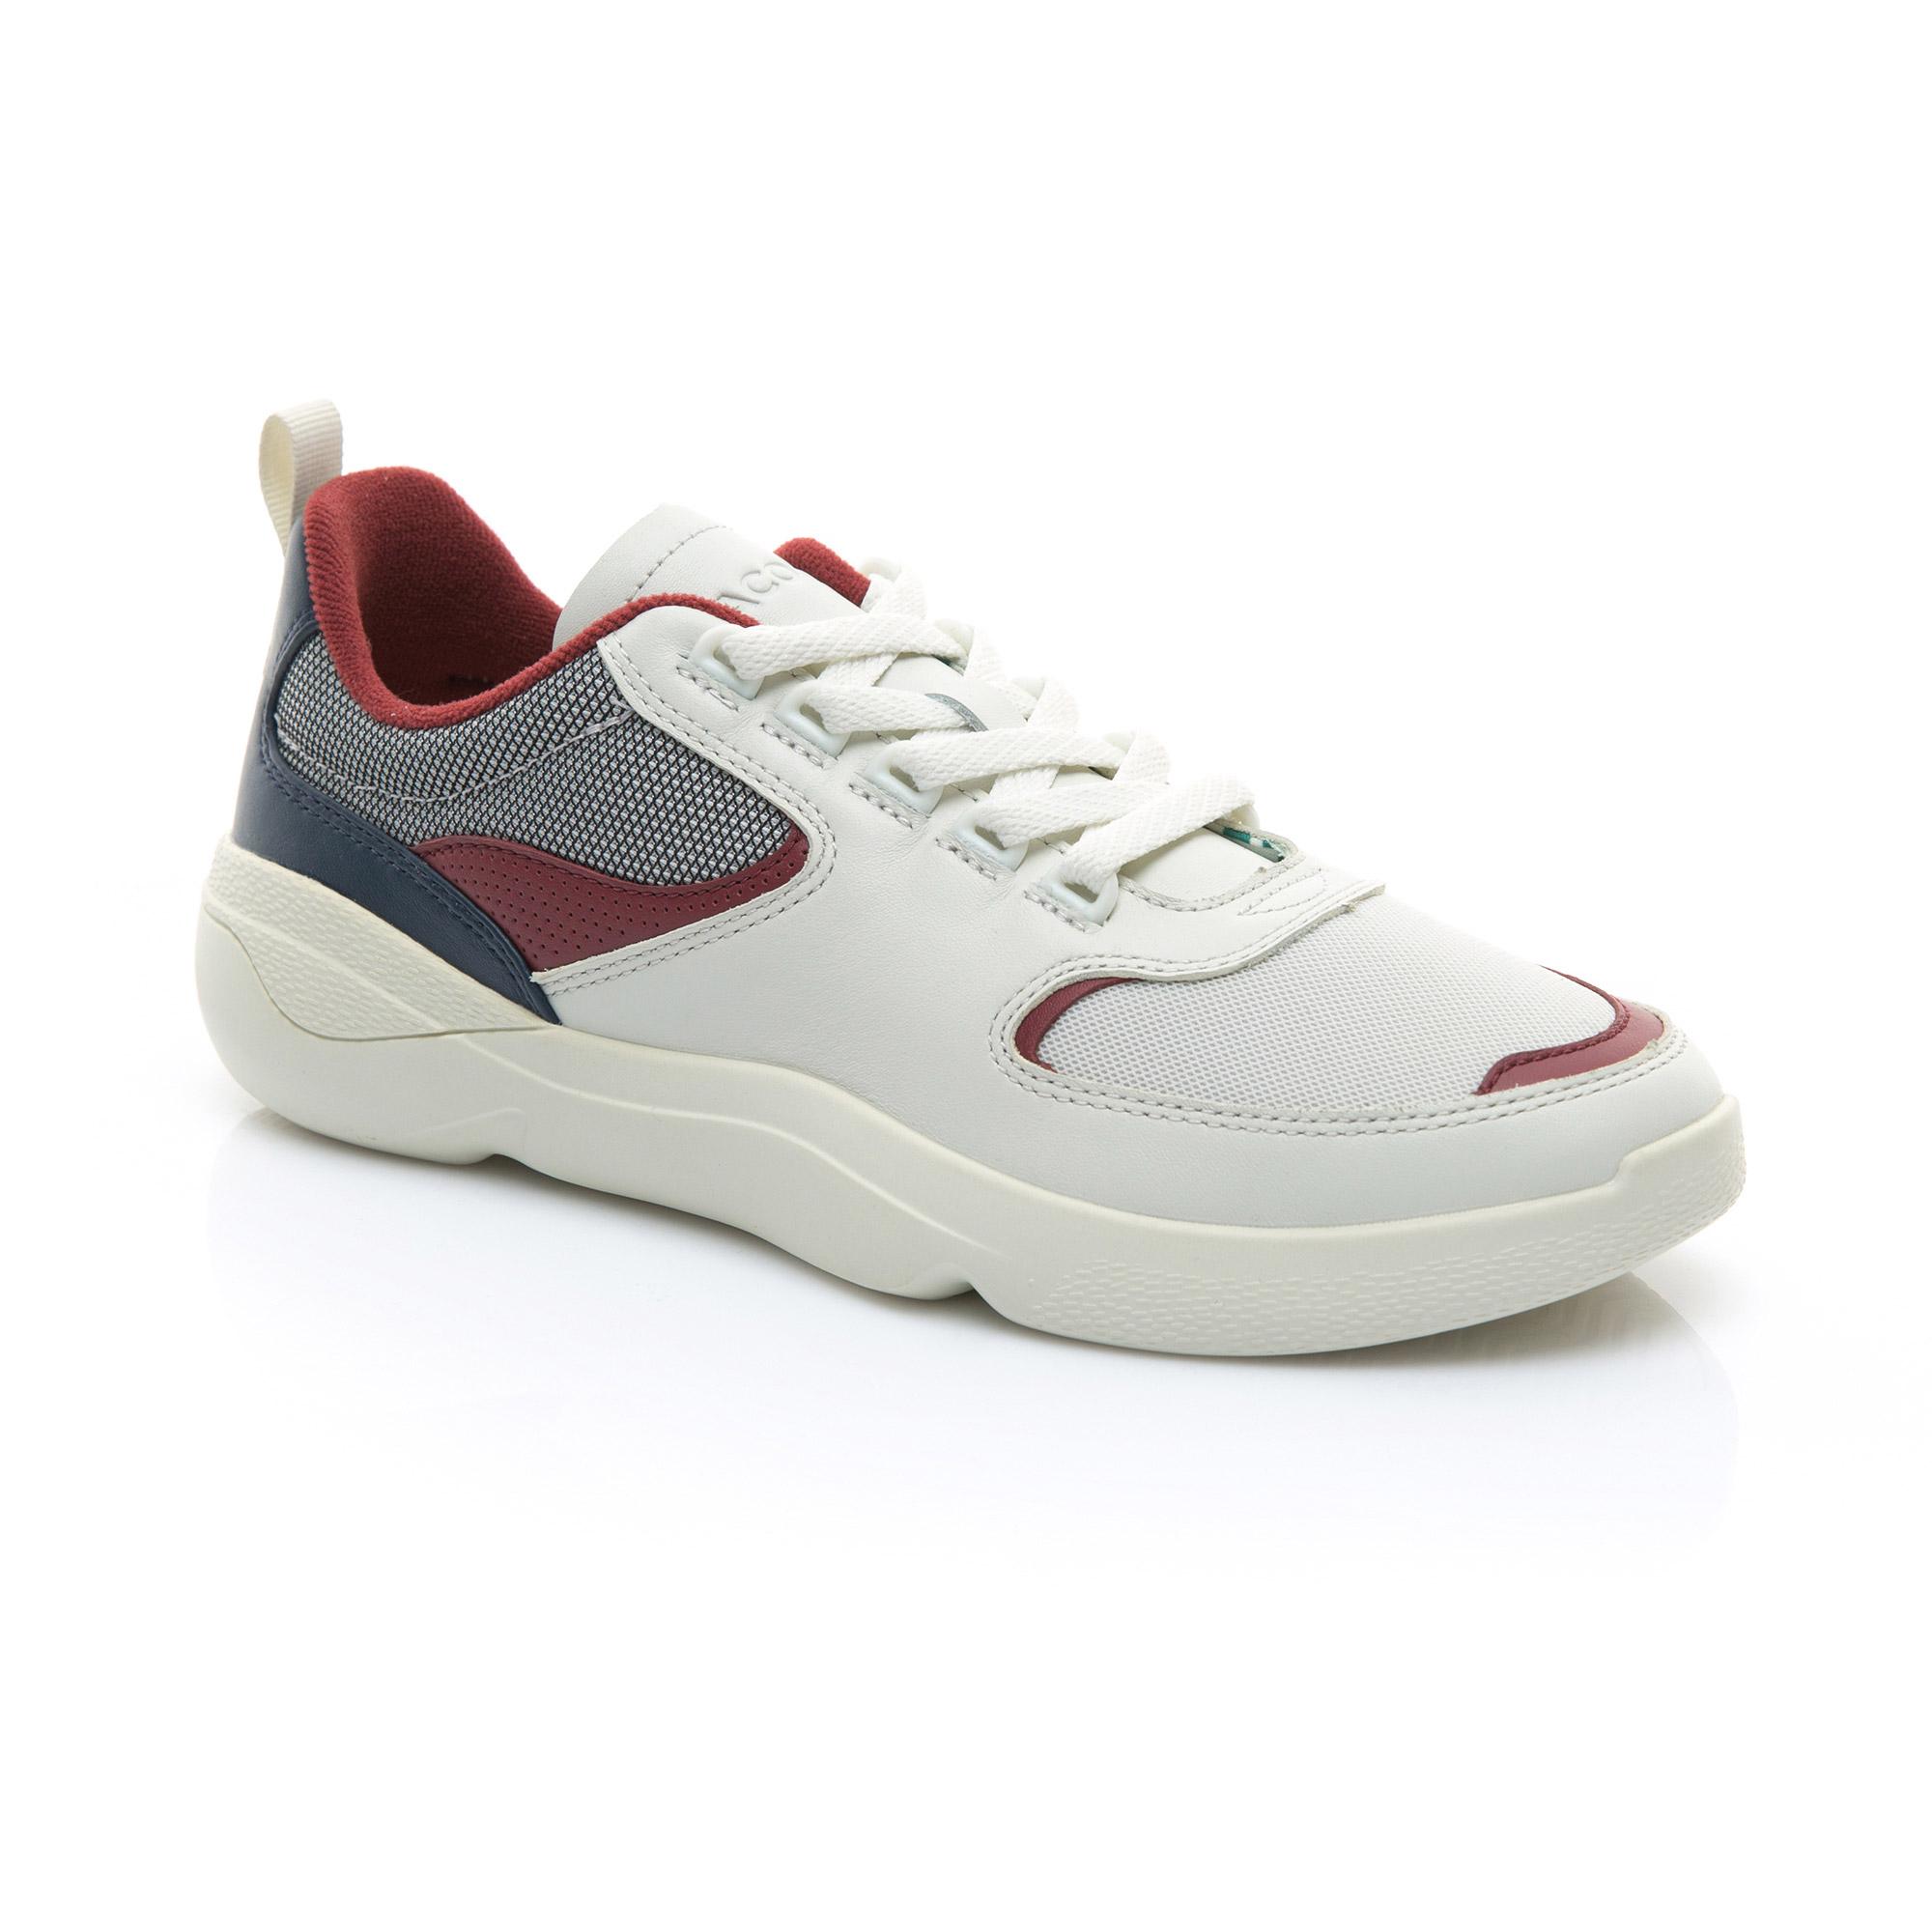 Lacoste WildCard 119 1 Męskie Sneakersy